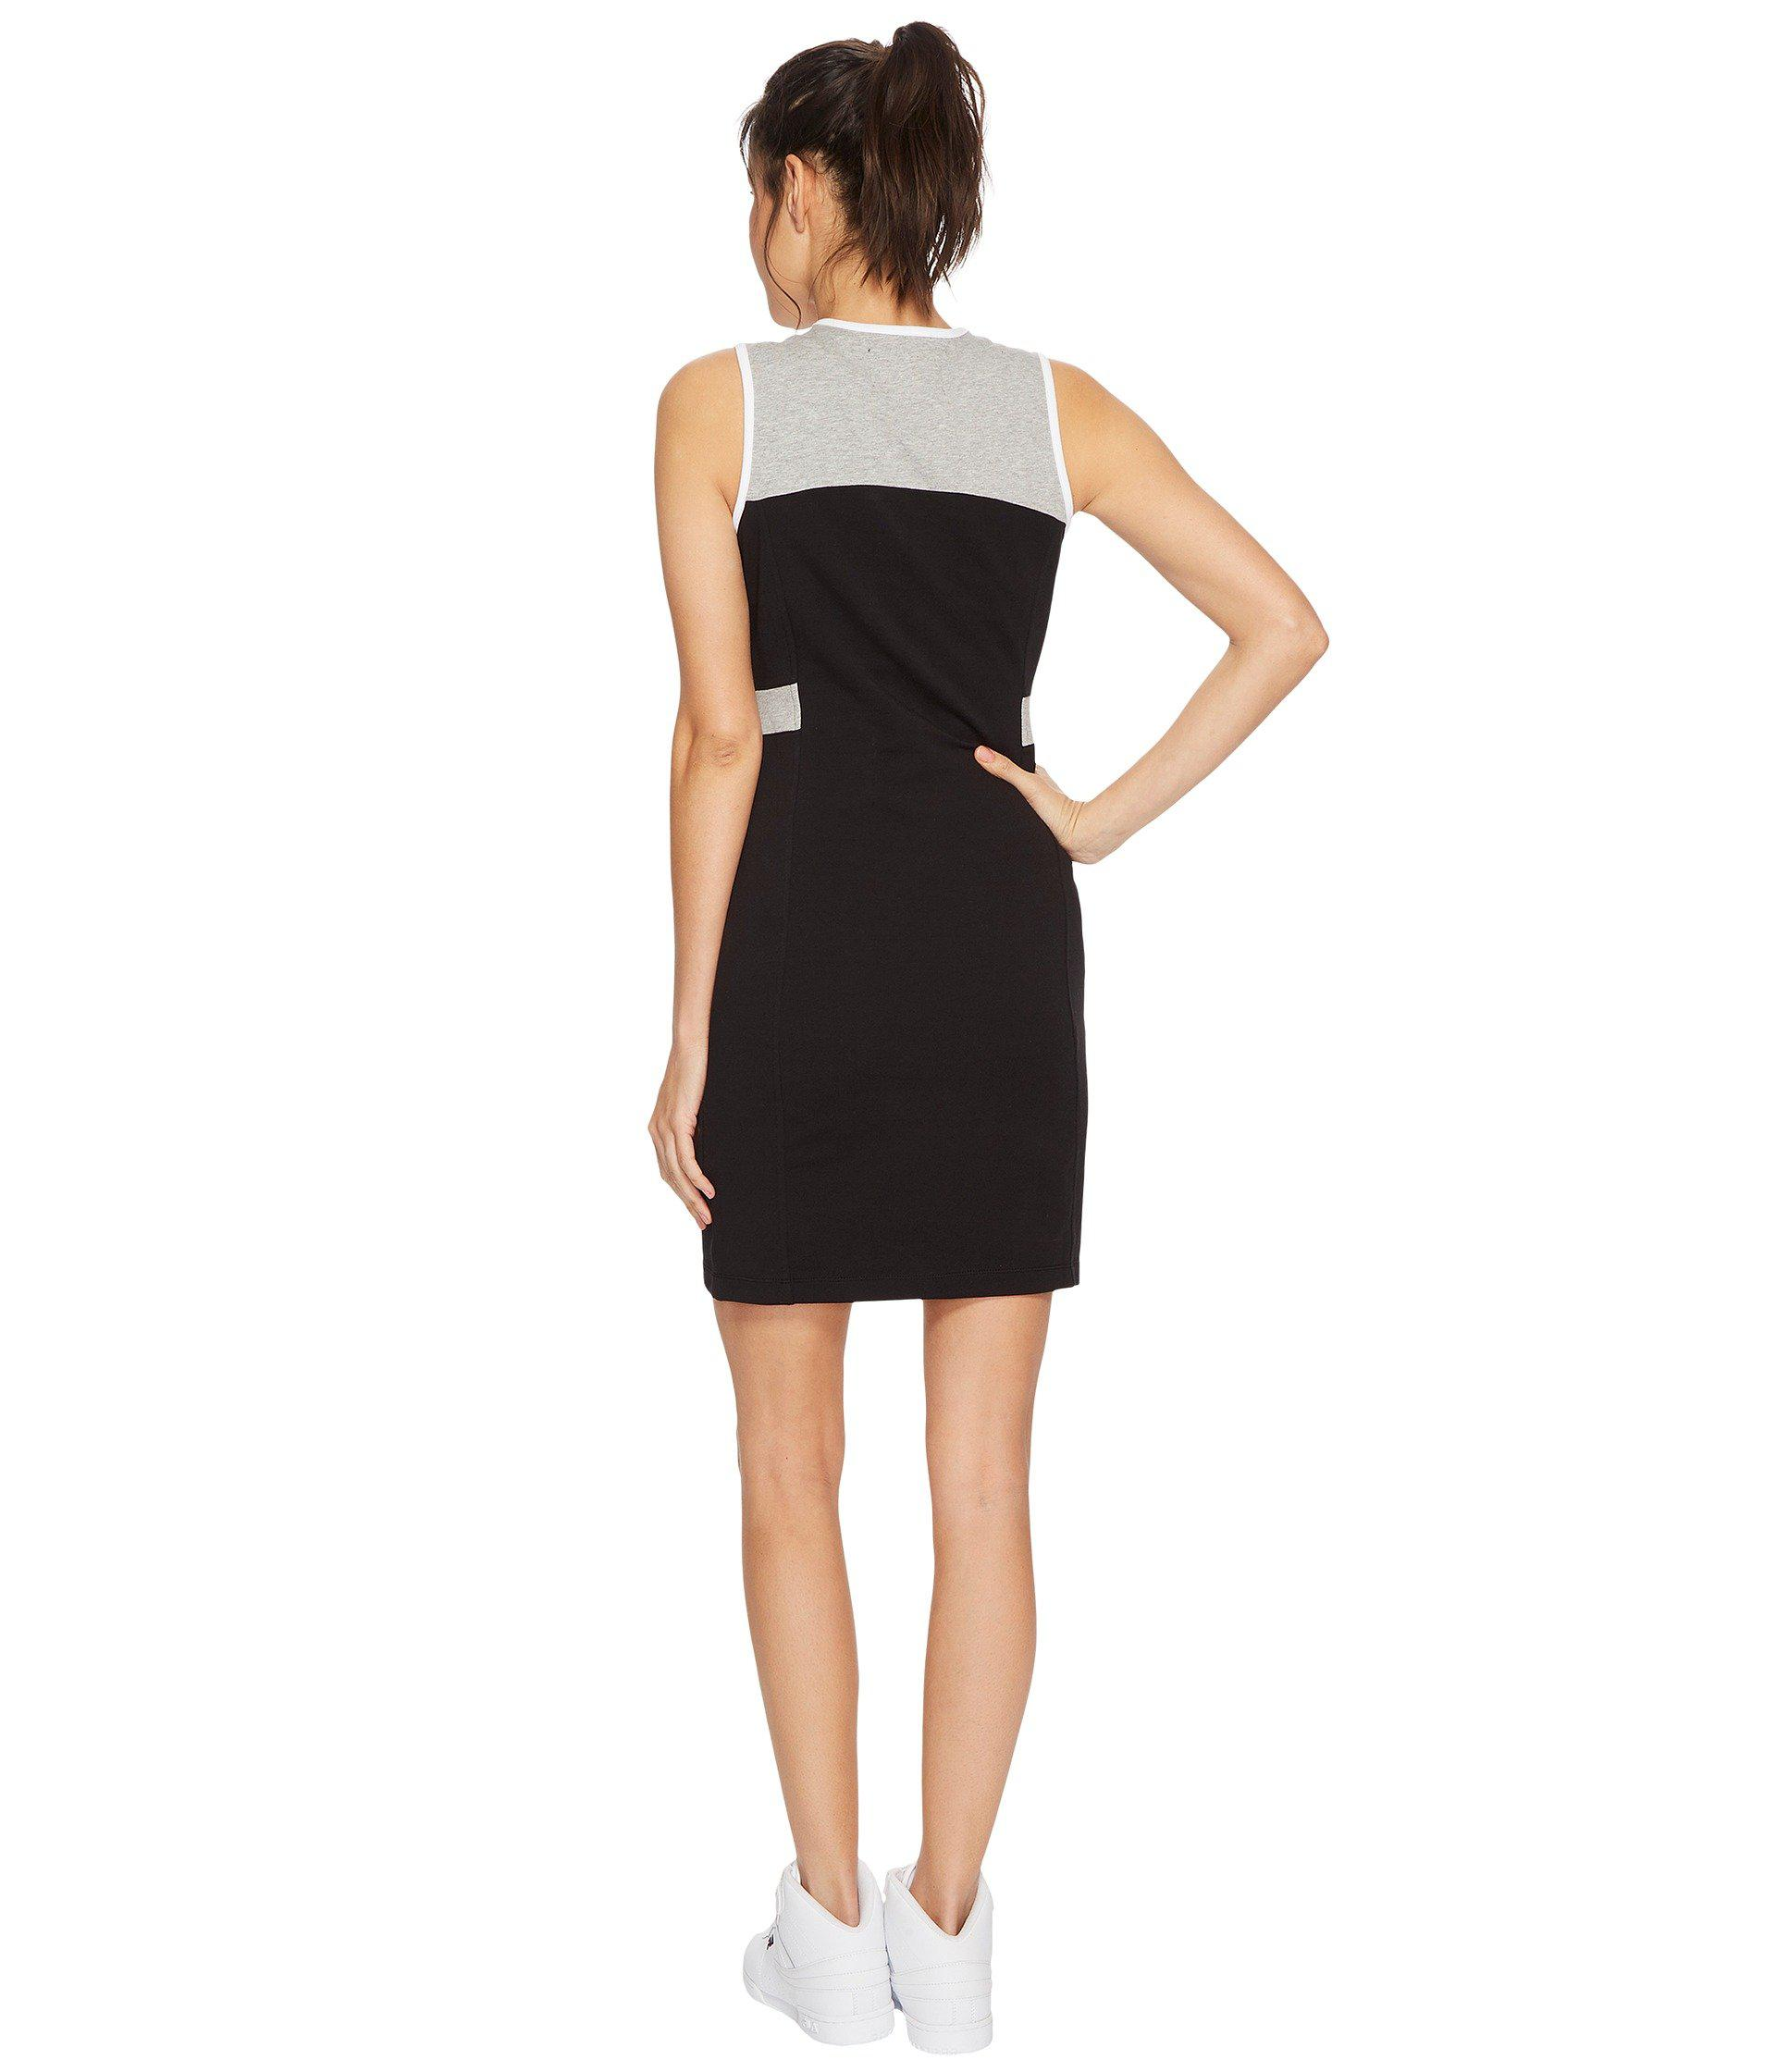 ab181ee91e91 Lyst - Fila Lacey Dress (white black gray Heather) Women s Dress in ...